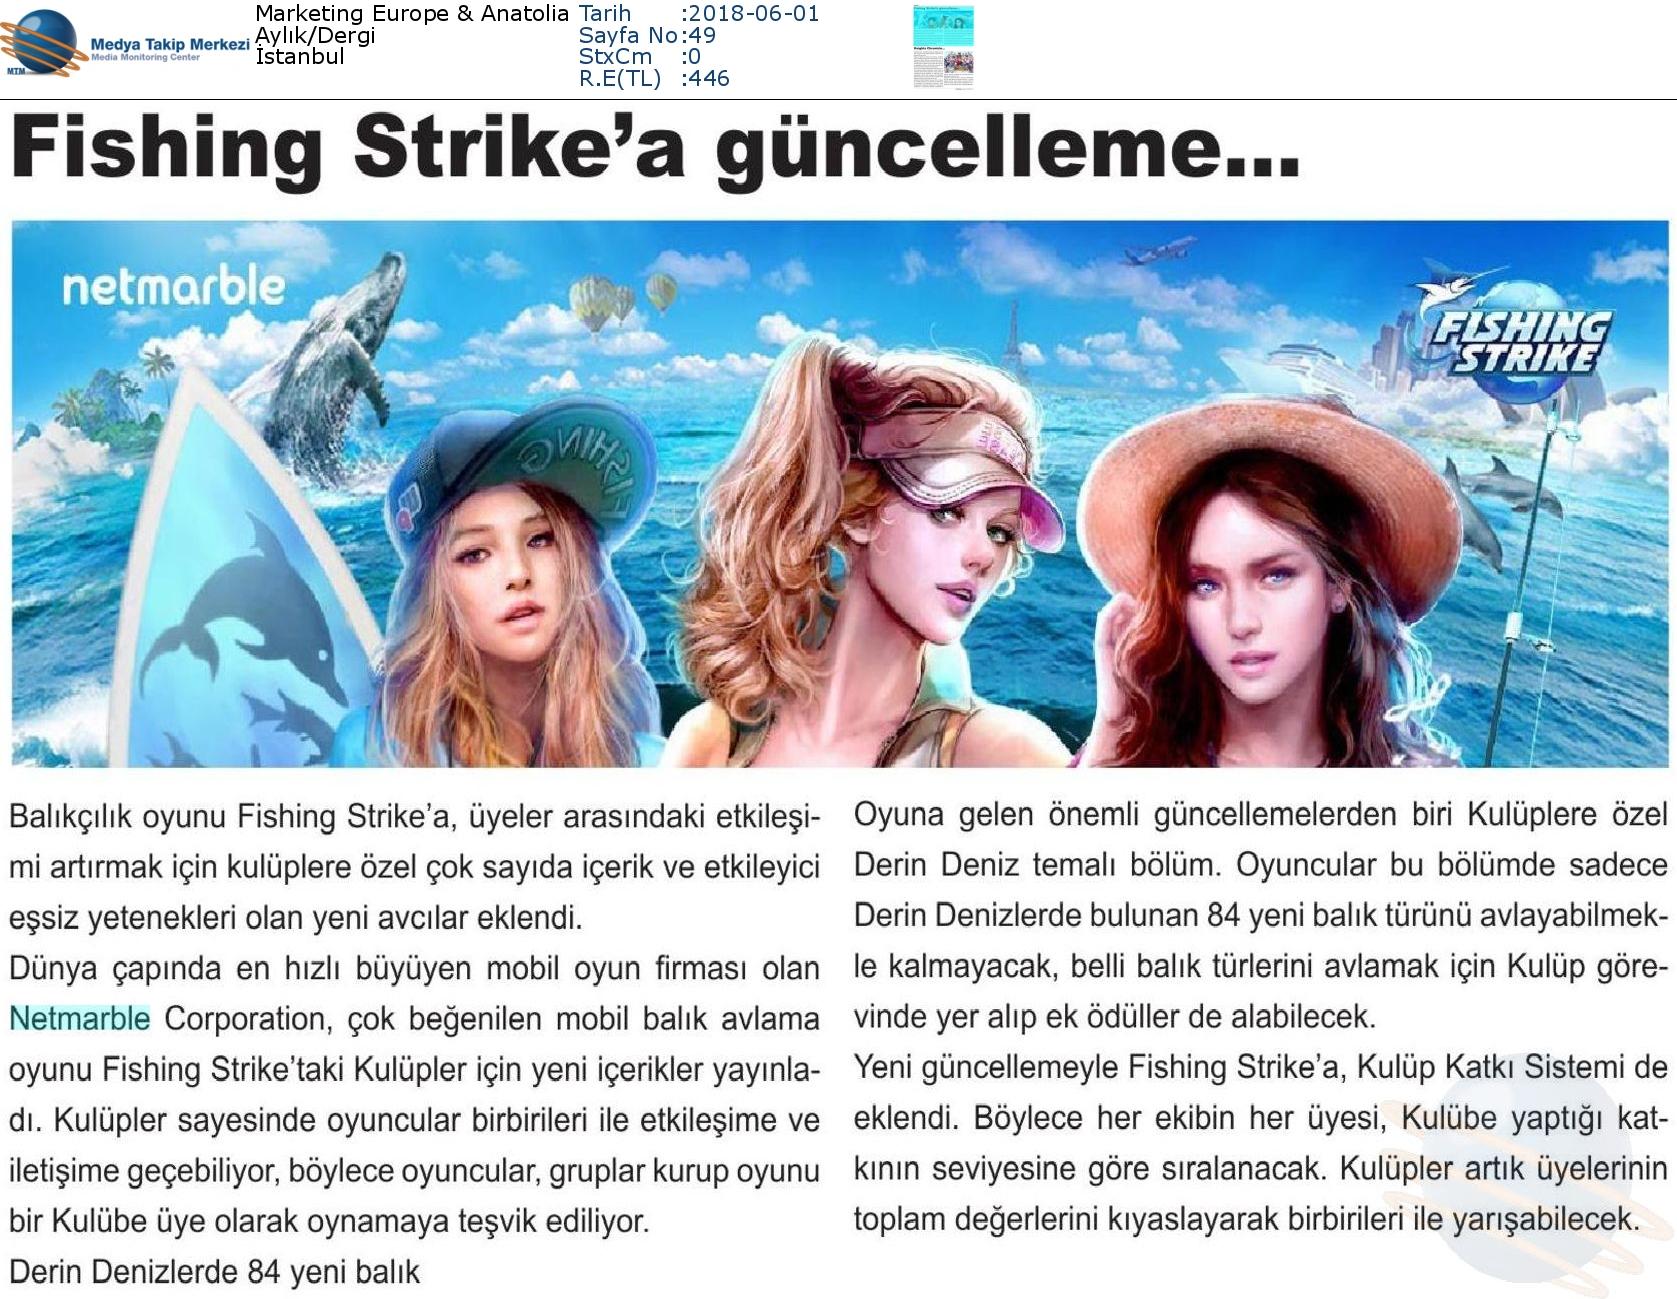 Marketing_Europe__Anatolia-FÝSHÝNG_STRÝKEA_GÜNCELLEME...-01.06.2018